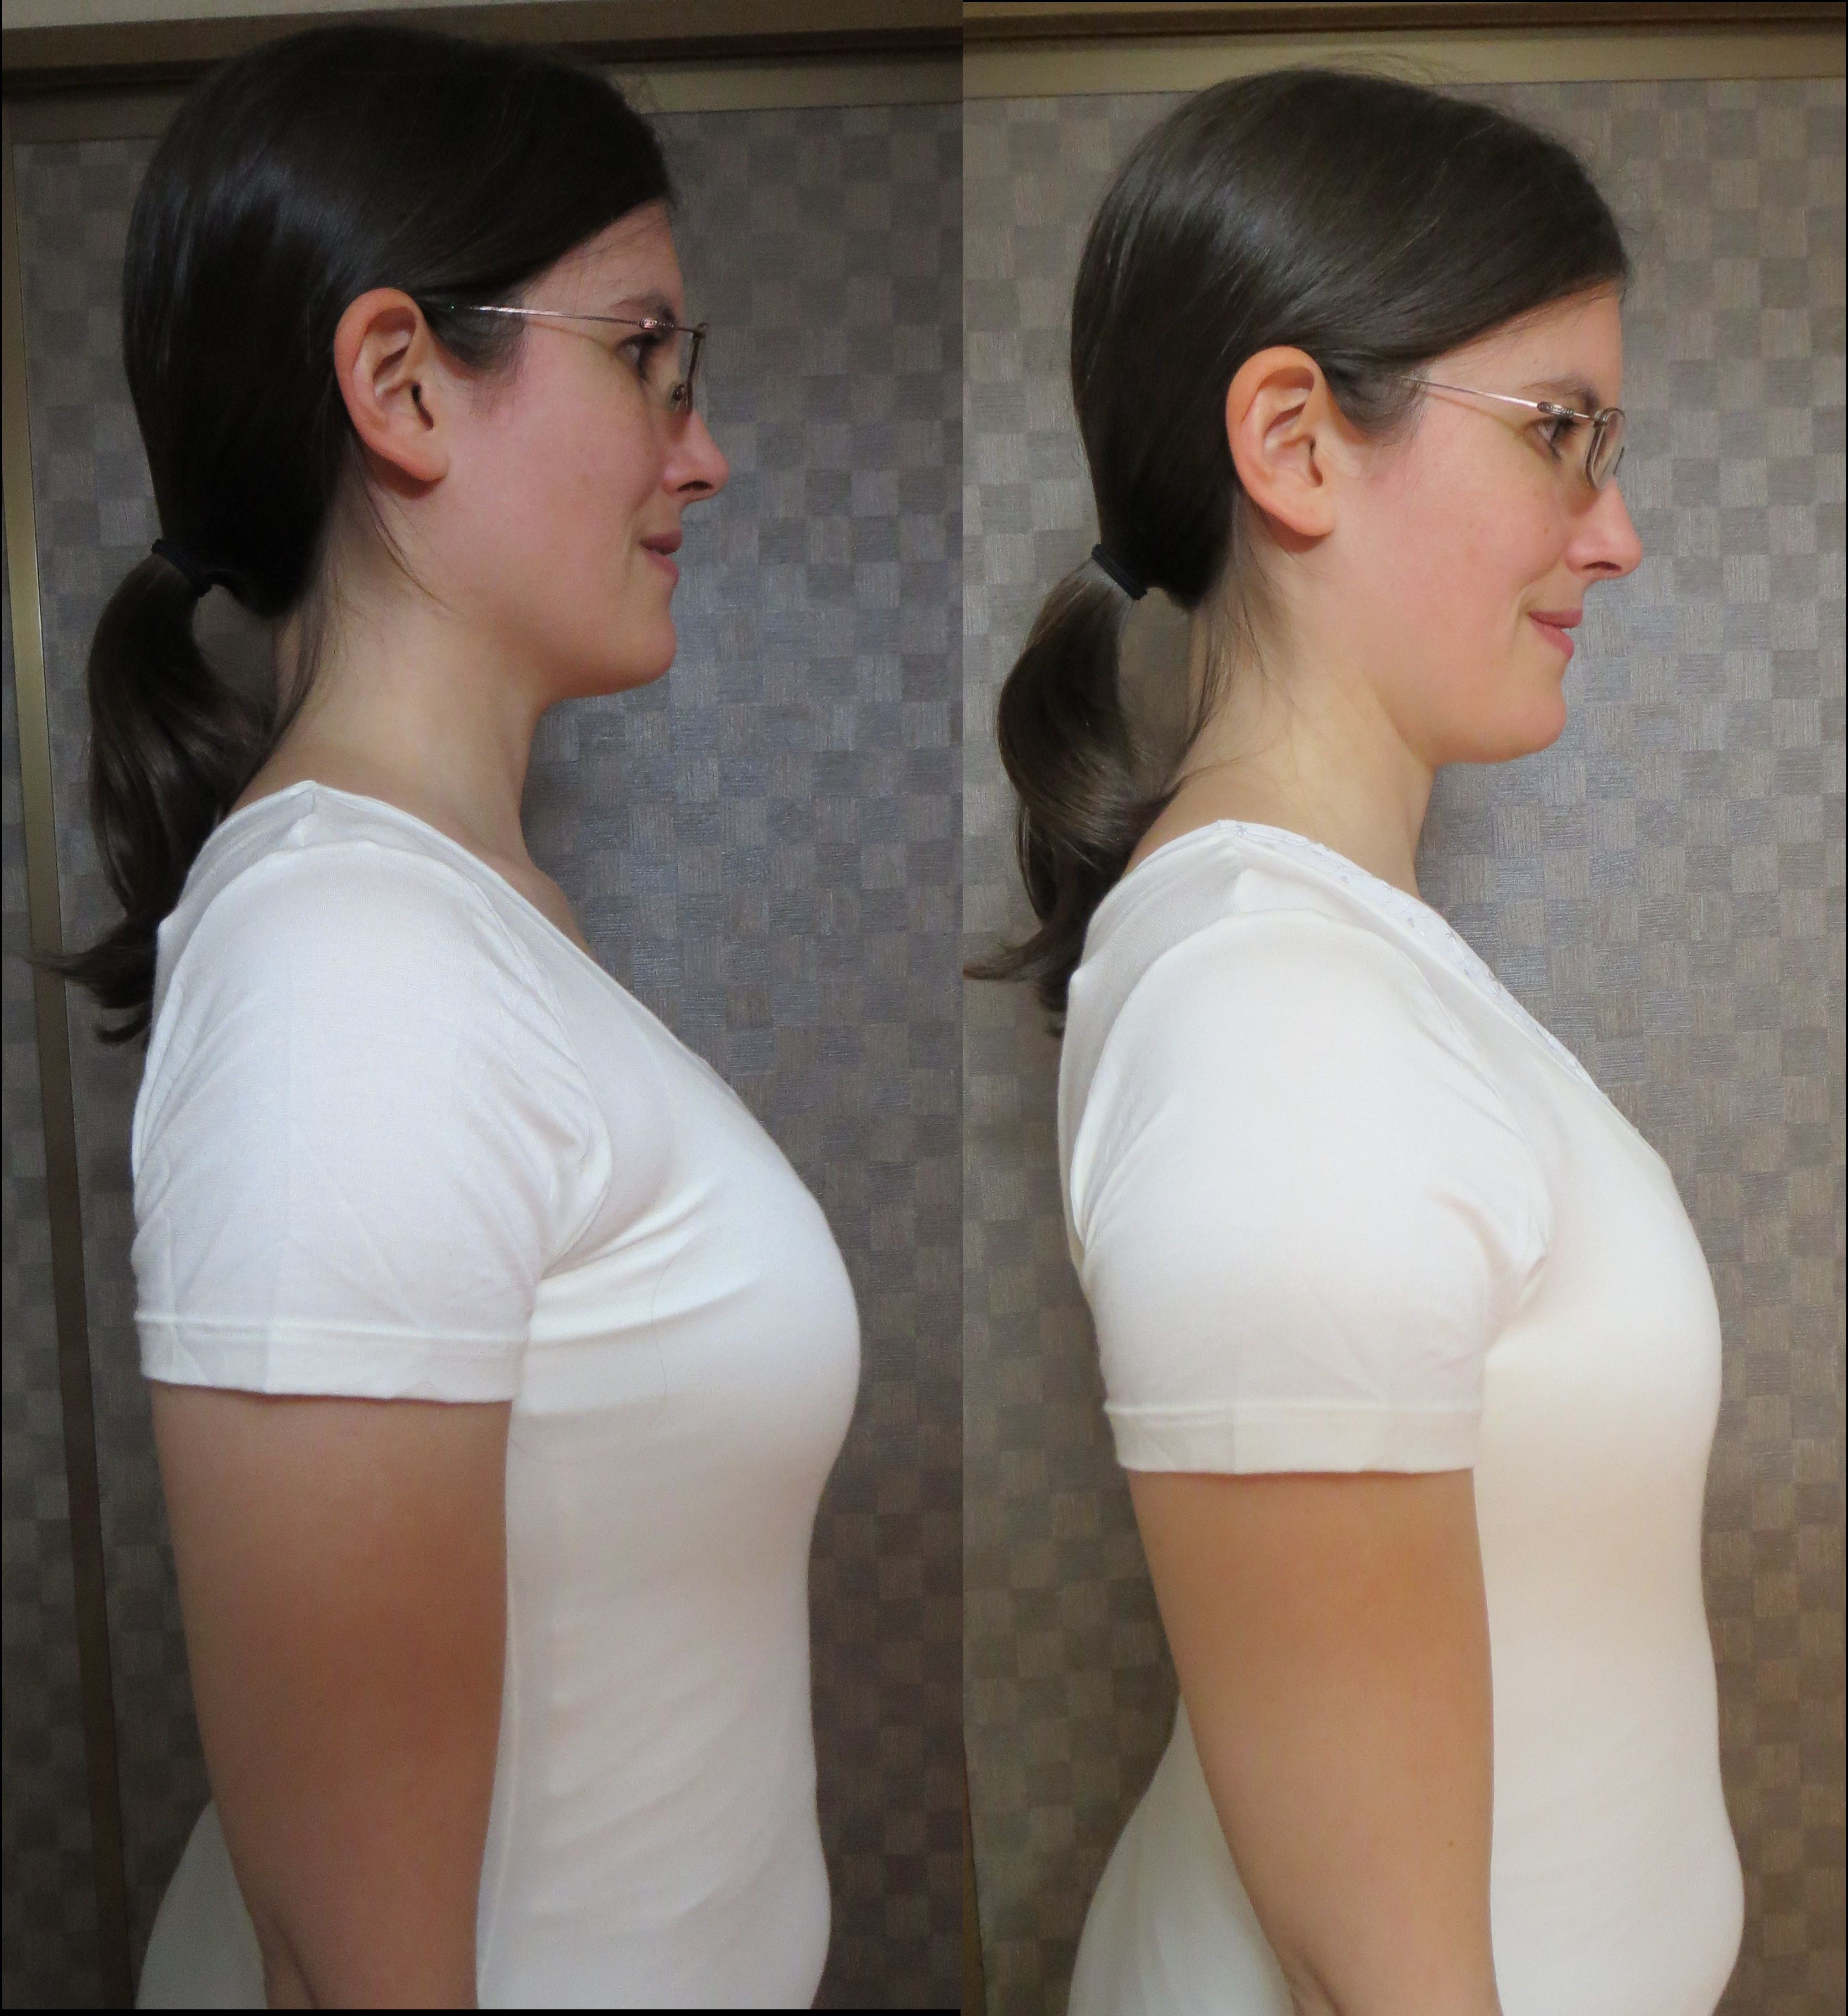 sports bra vs regular bra